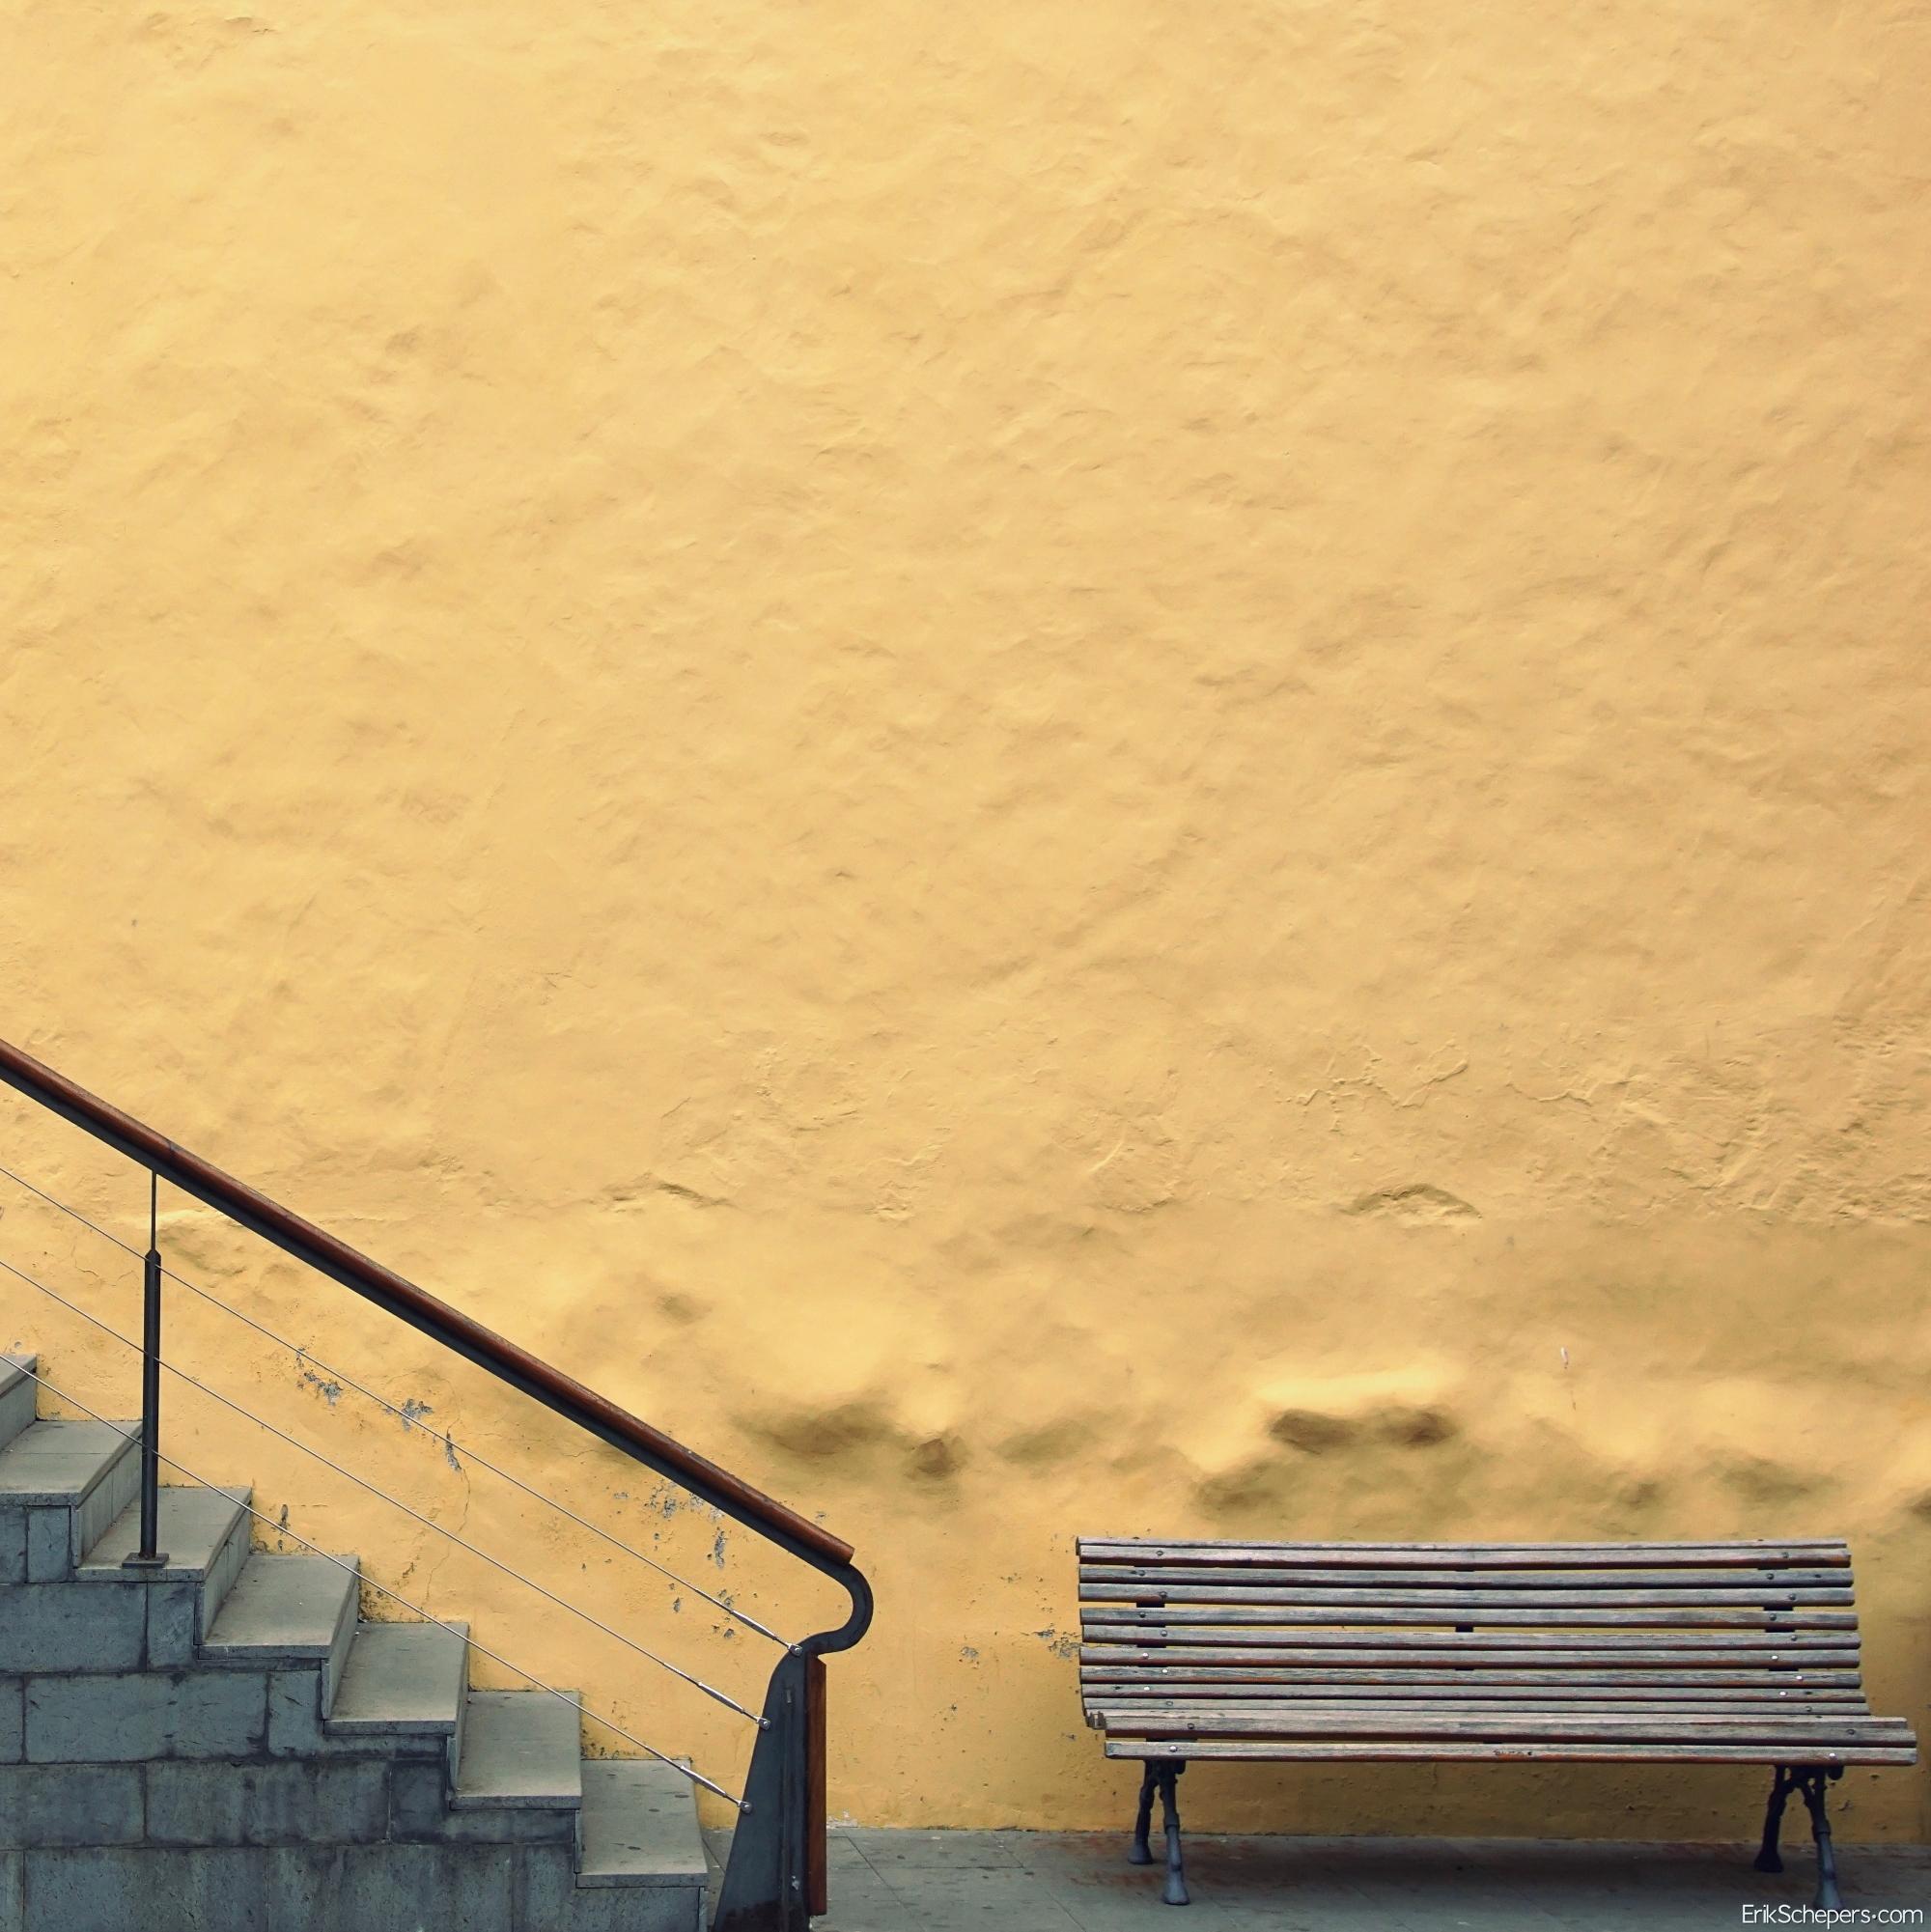 Stair bench Tenerife, los Silos - erik_schepers   ello